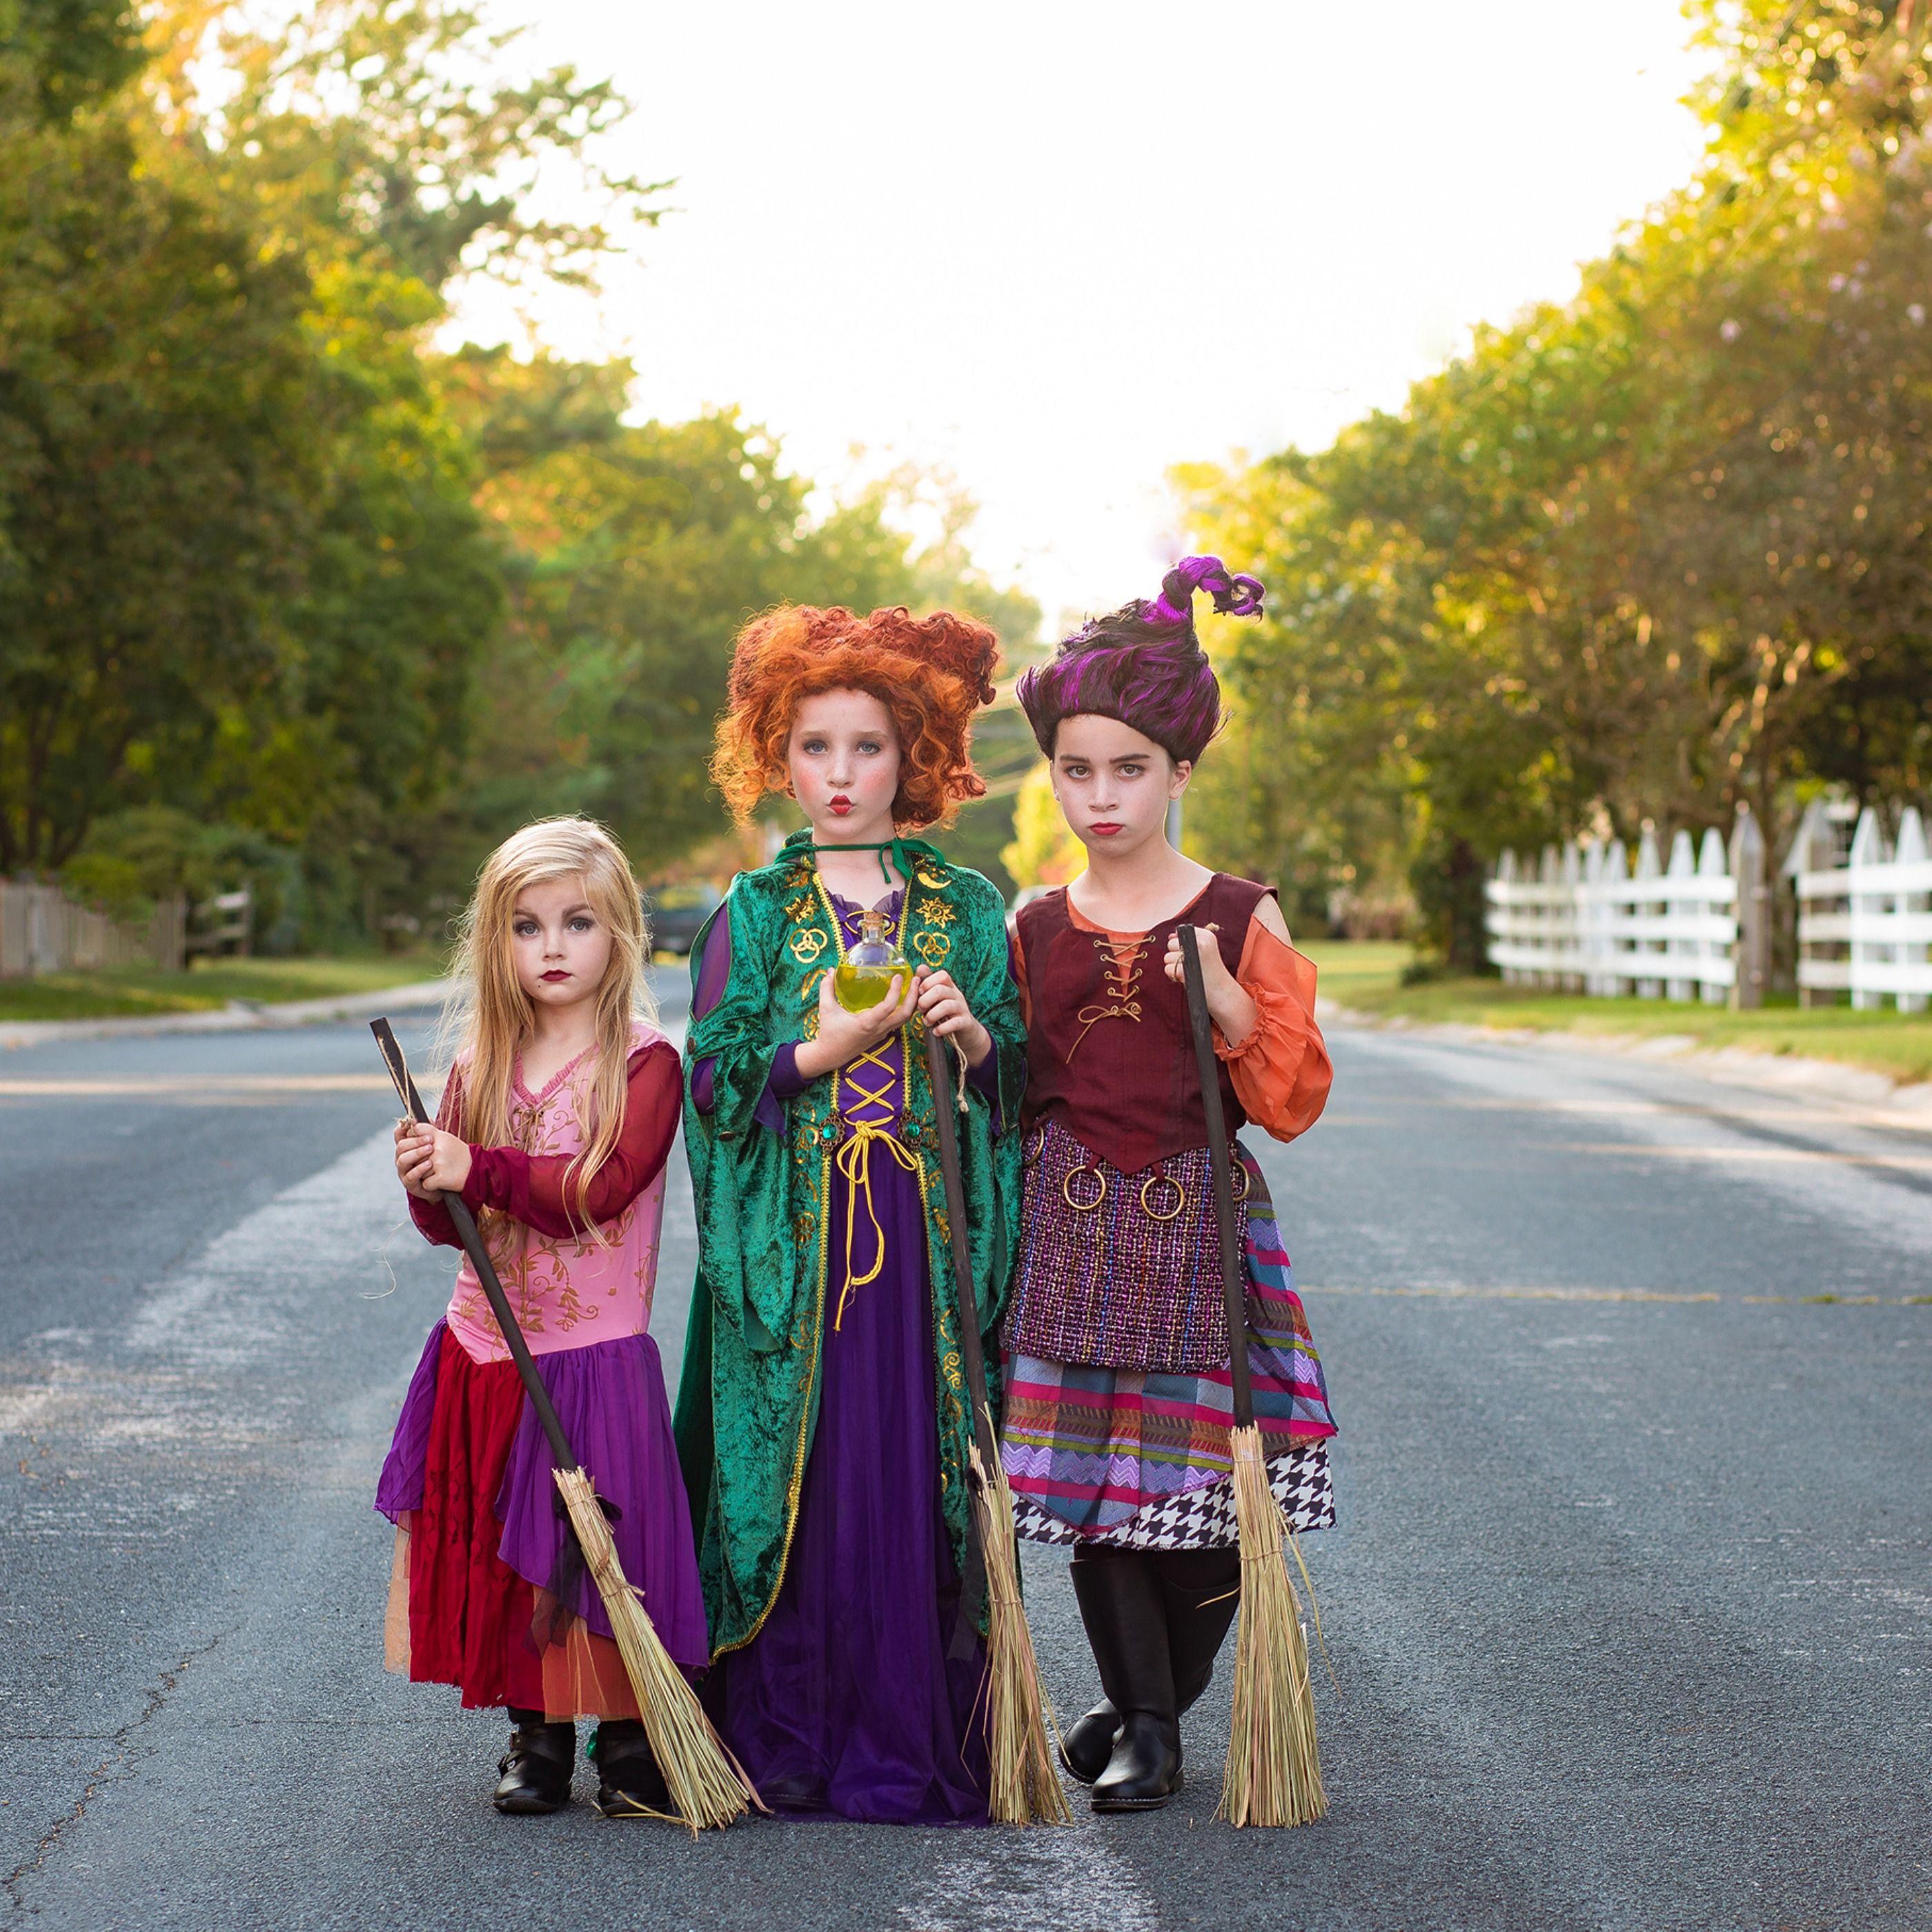 Rehoboth Halloween Parade 2020 Hocus Pocus in 2020   Halloween photoshoot, Bethany beach